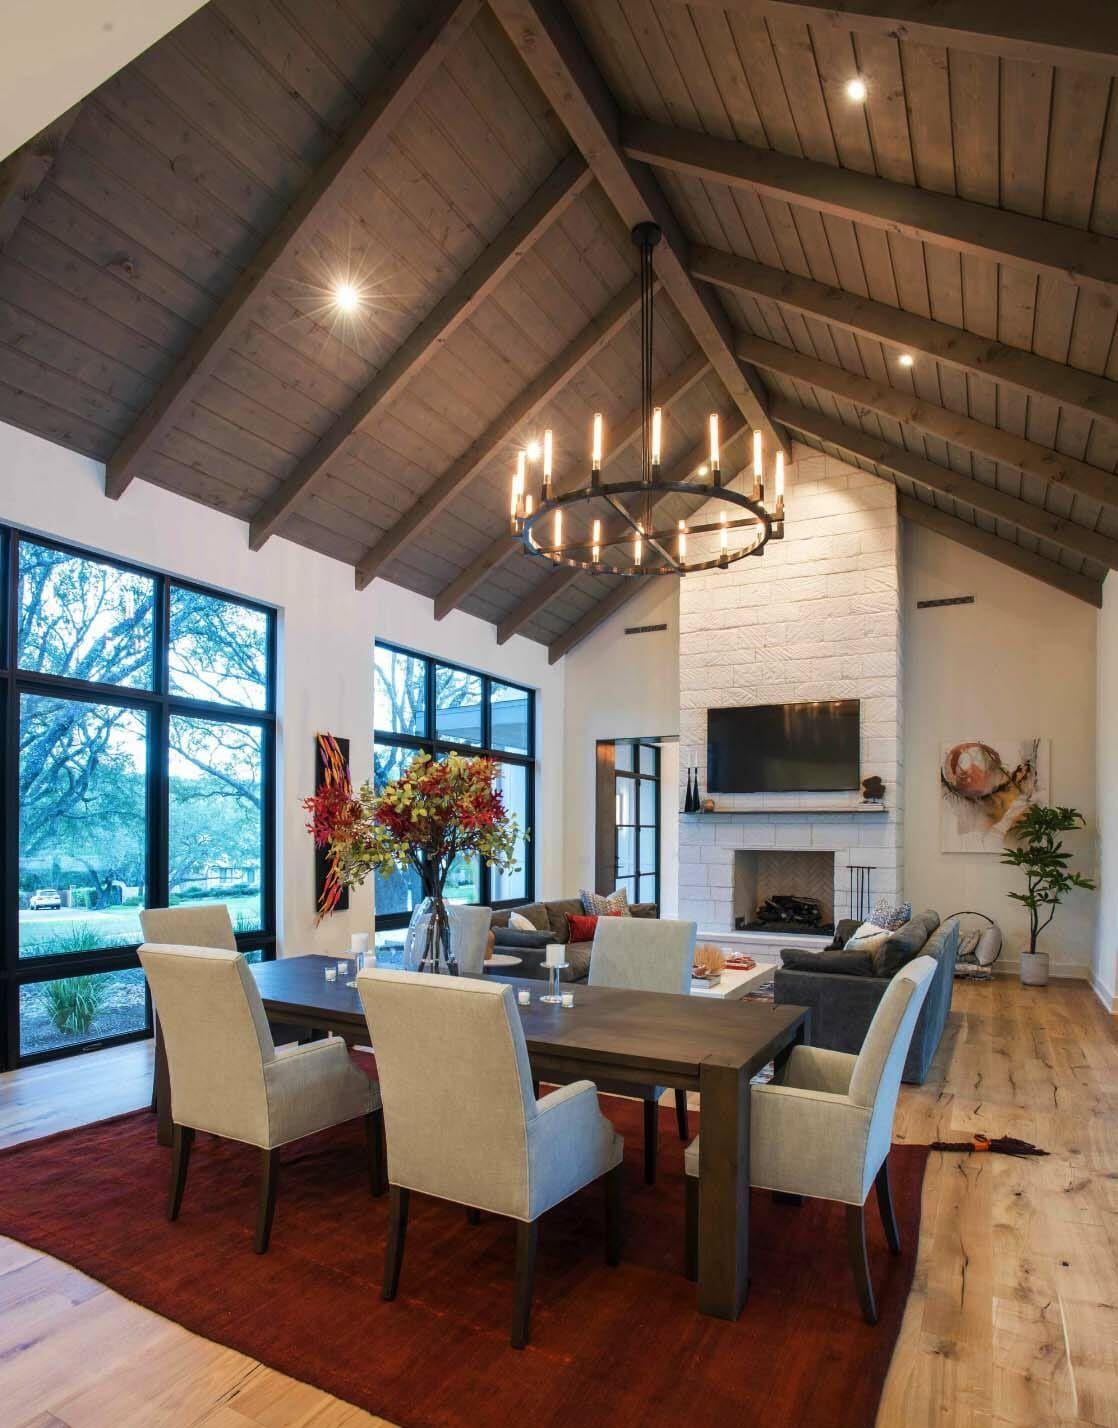 Modern farmhouse style in Texas showcases fantastic design inspiration